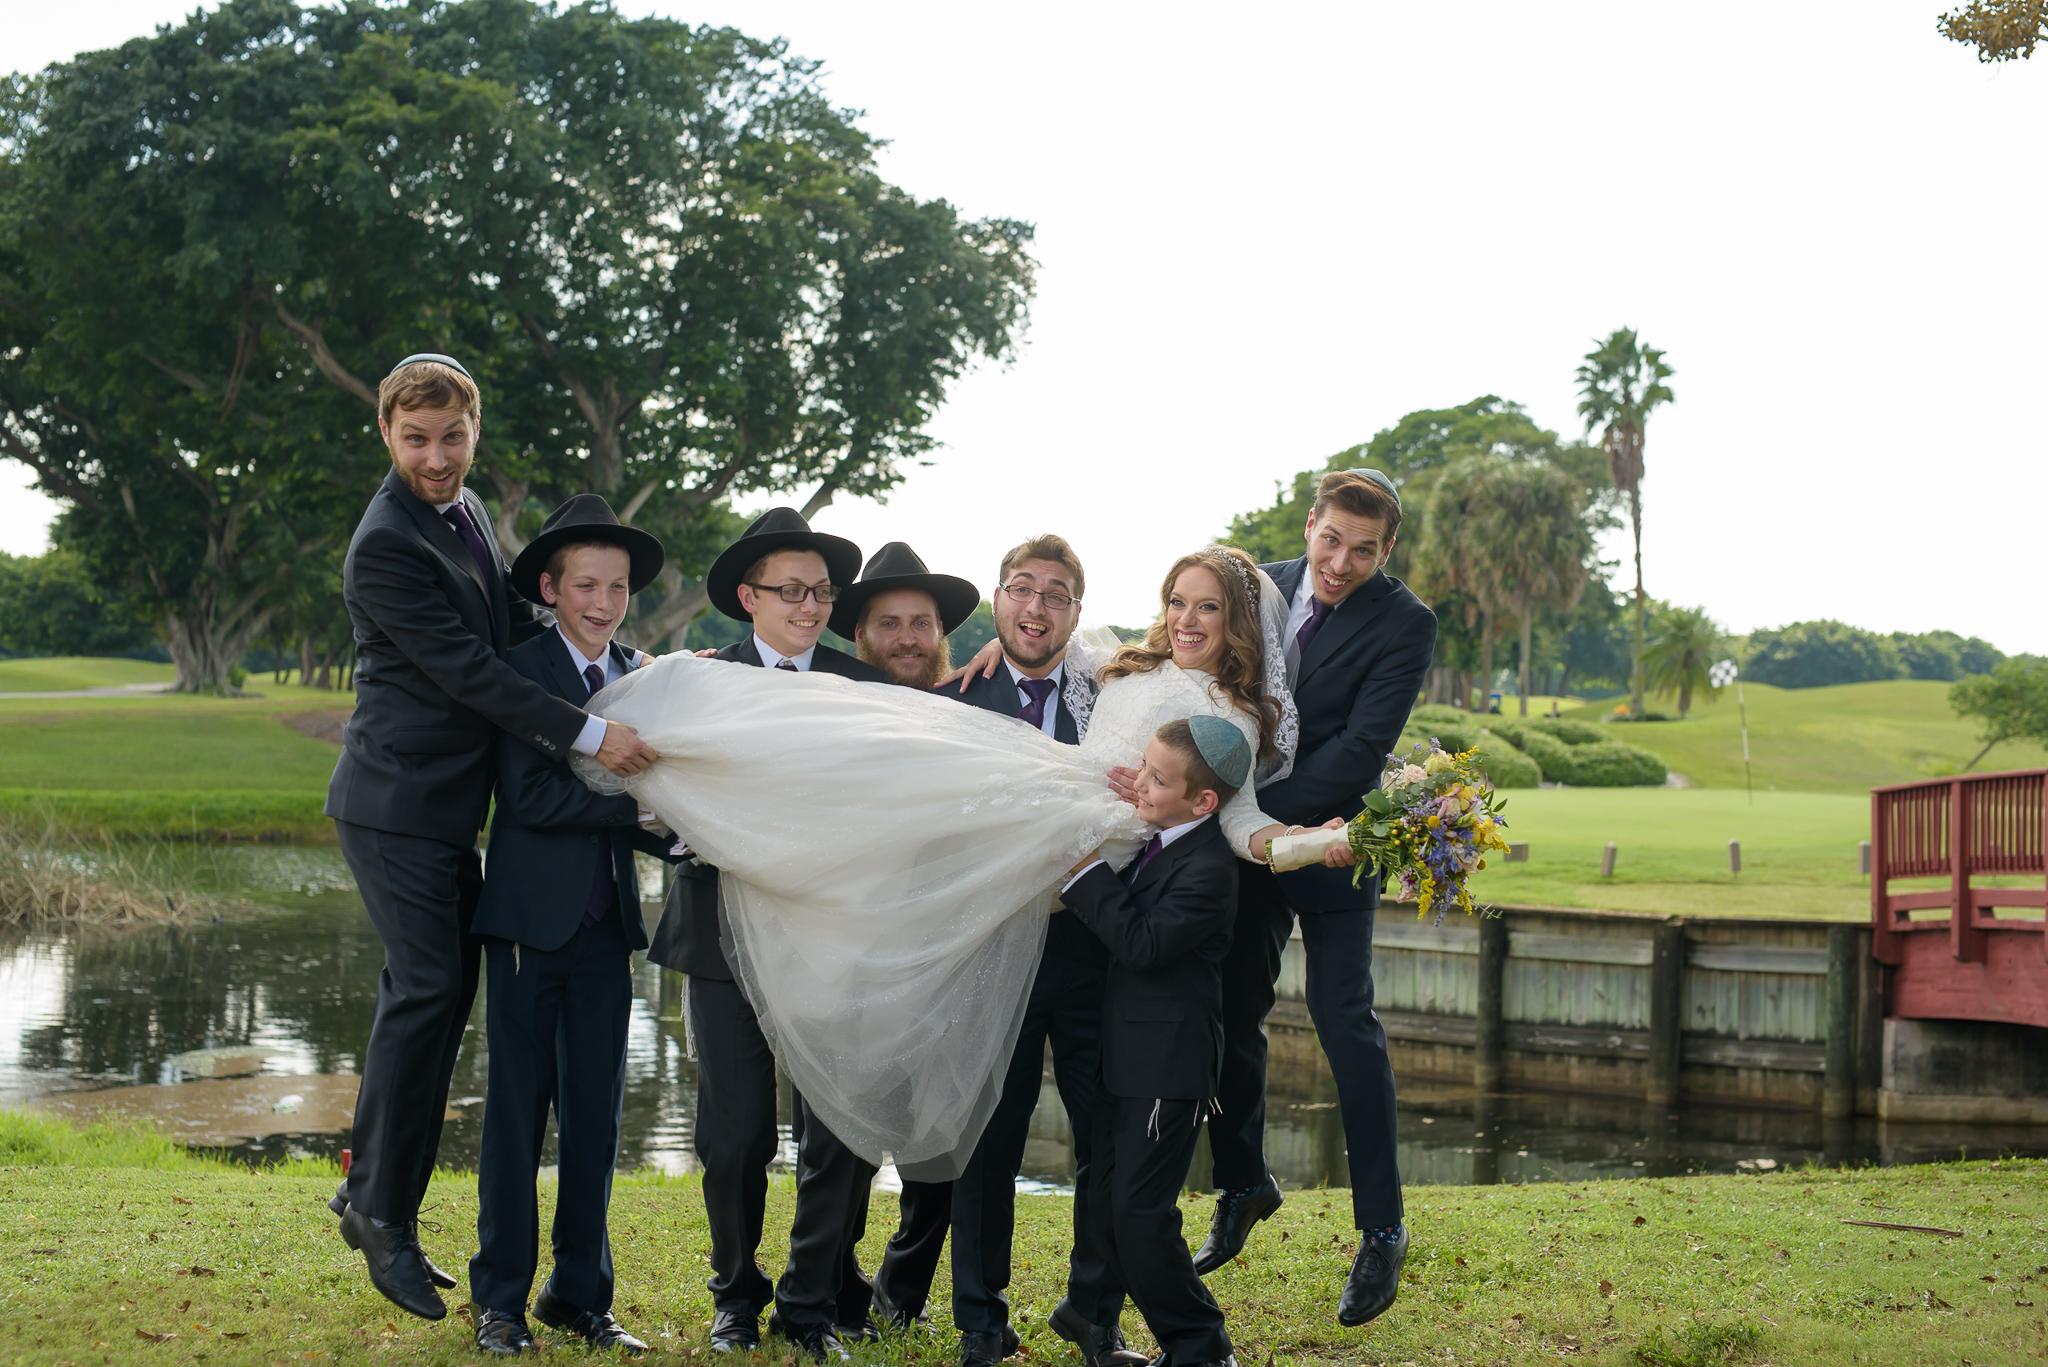 Wedding by Levikfoto.com-018.jpg